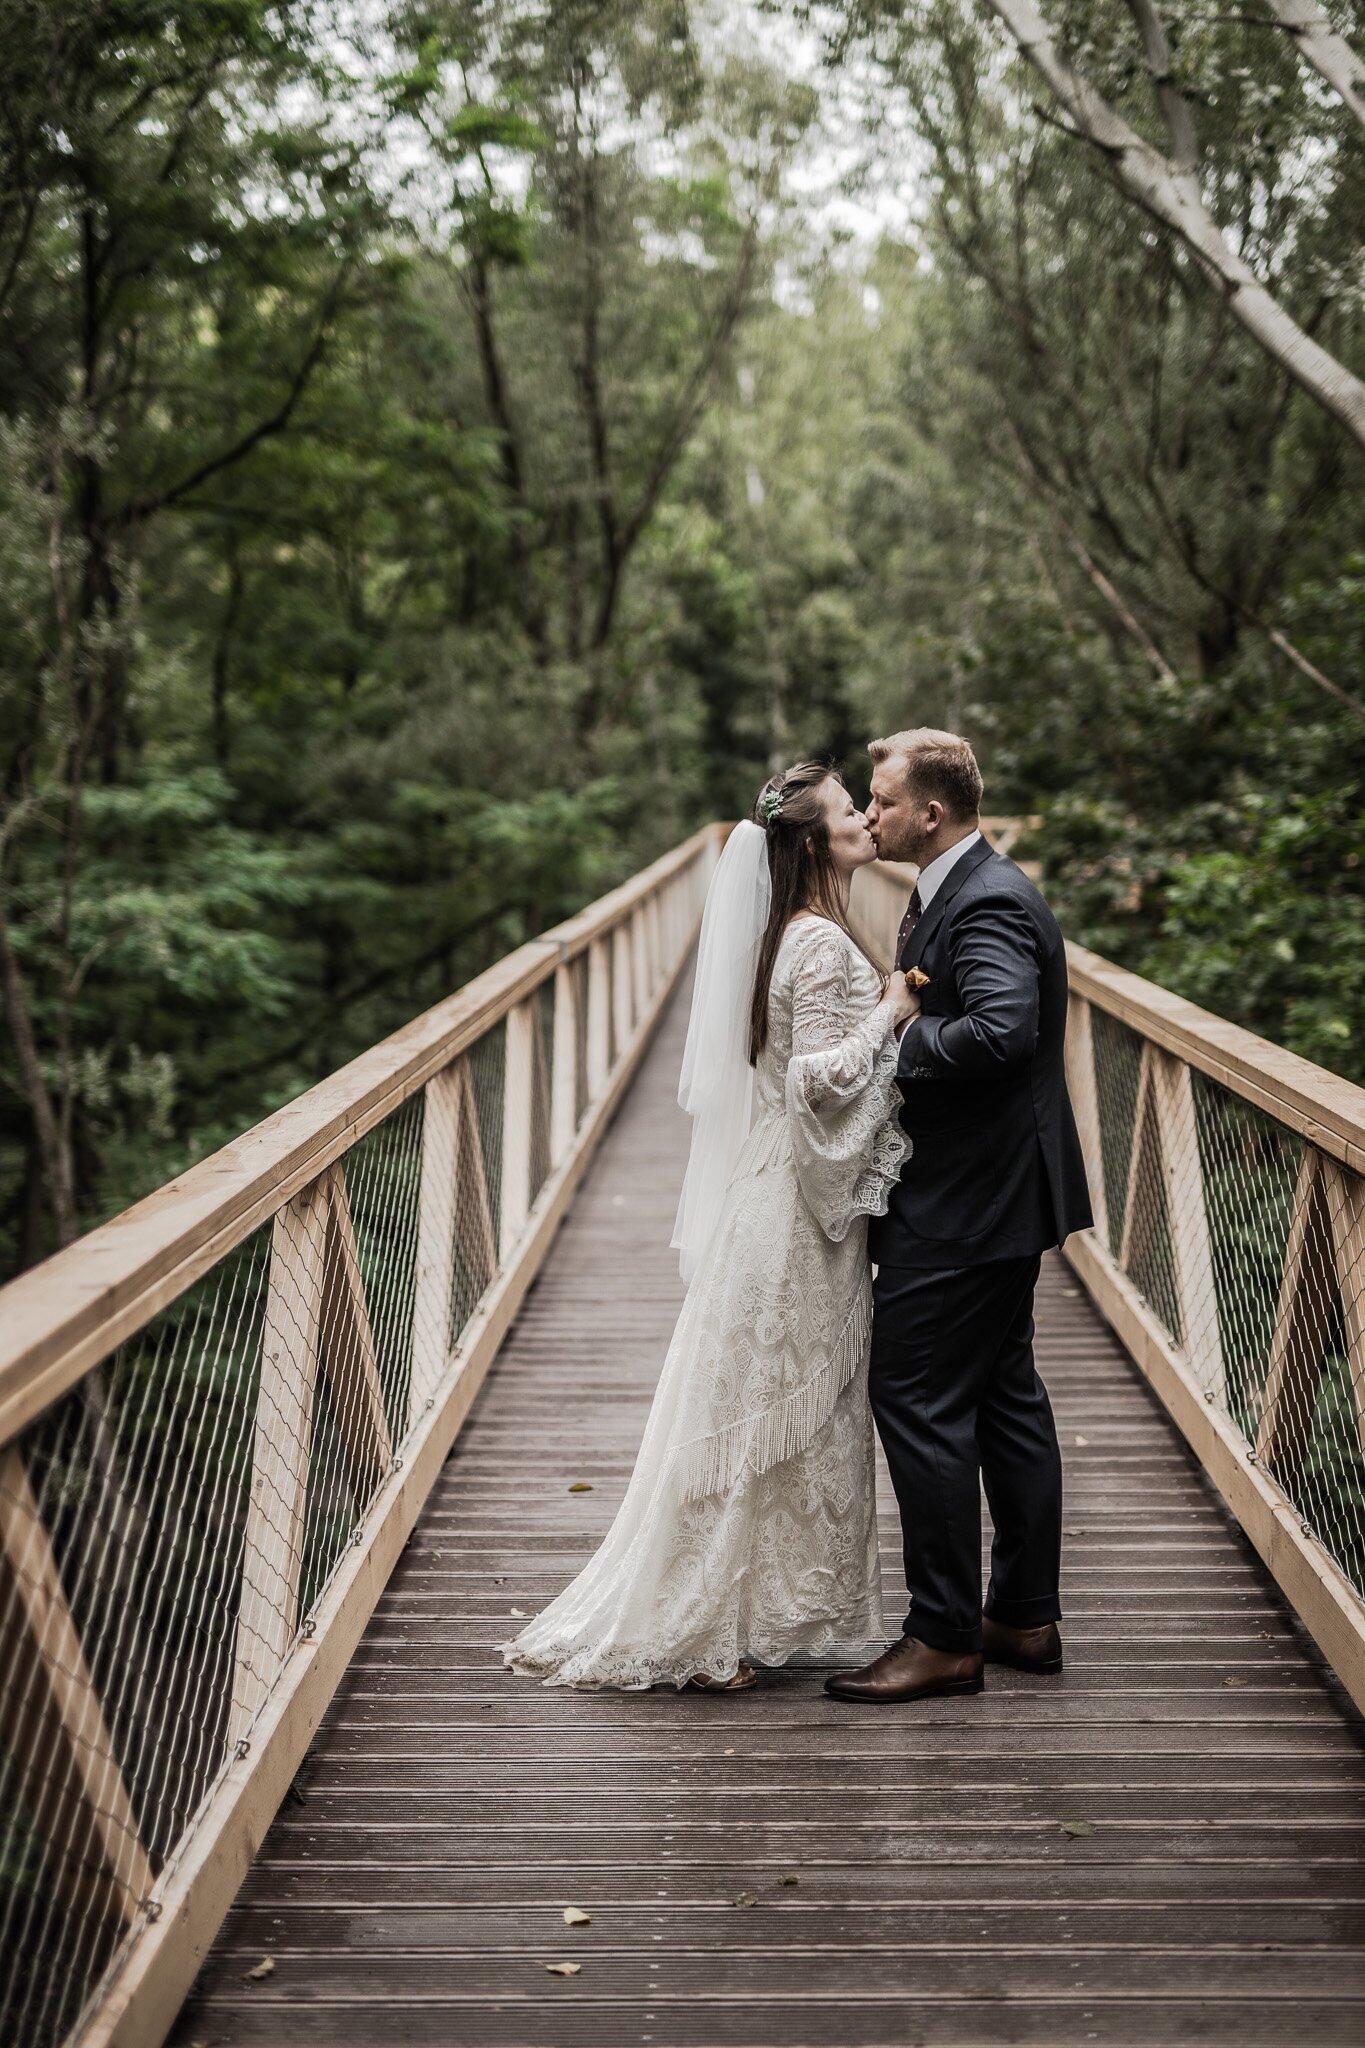 Sesja ślubna - Marta i Kuba - IMG_5641